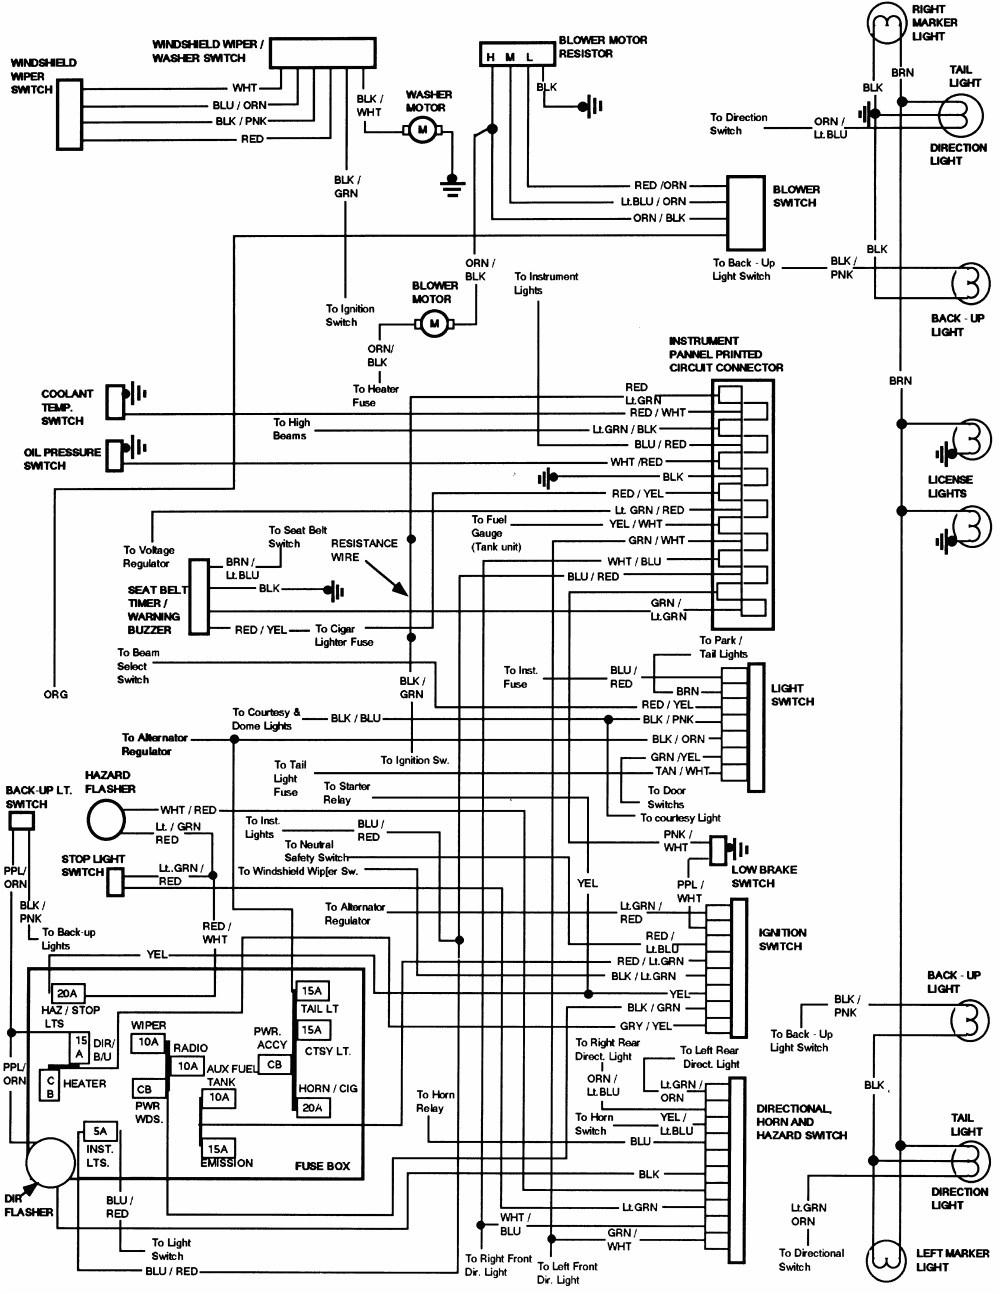 wiring diagram symbols moreover 1994 ford bronco rear window wiring wiring diagram also 2004 ford f